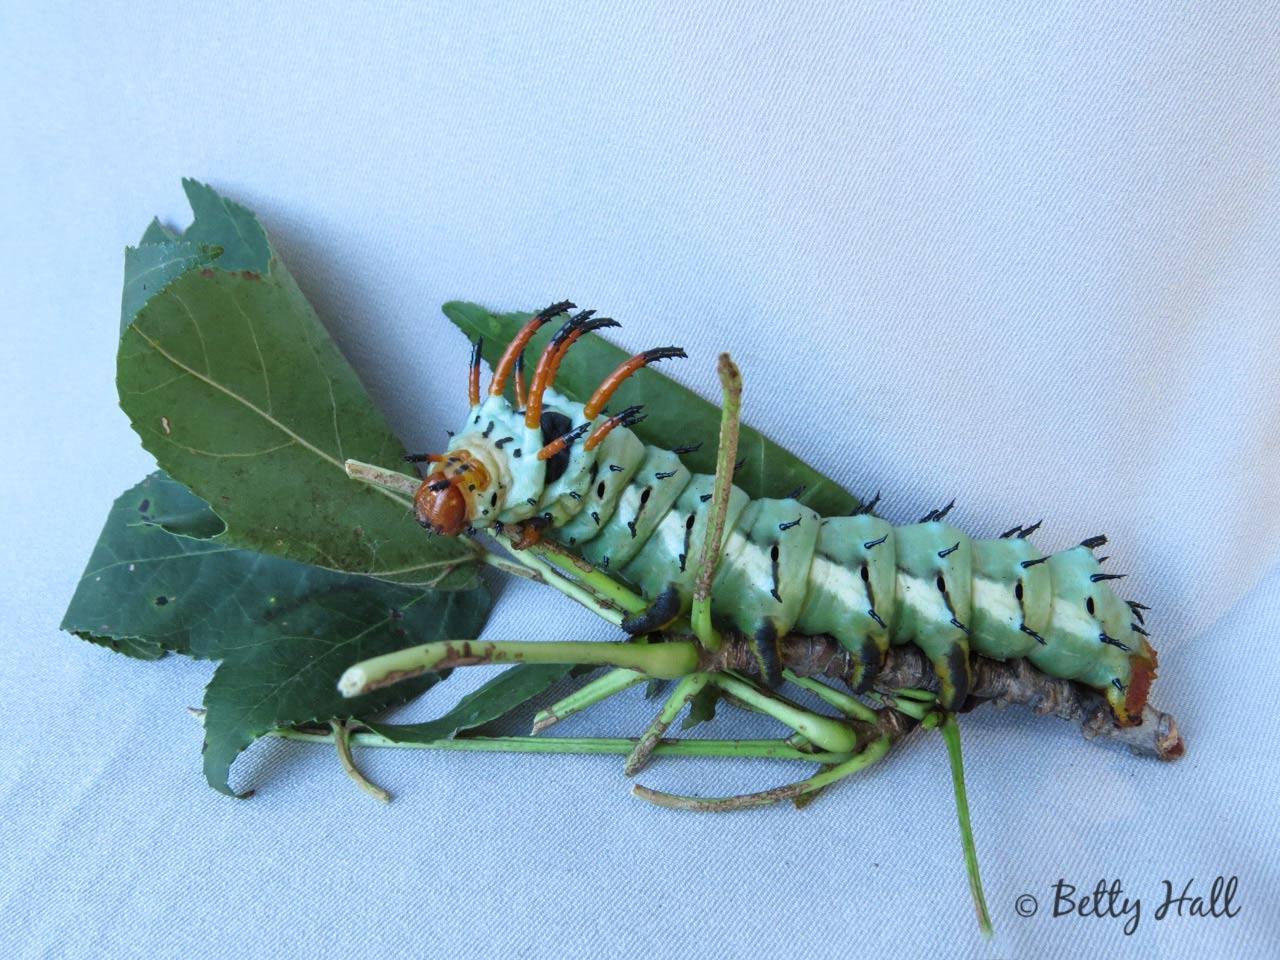 Hickory horned devil caterpillar - turquoise phase